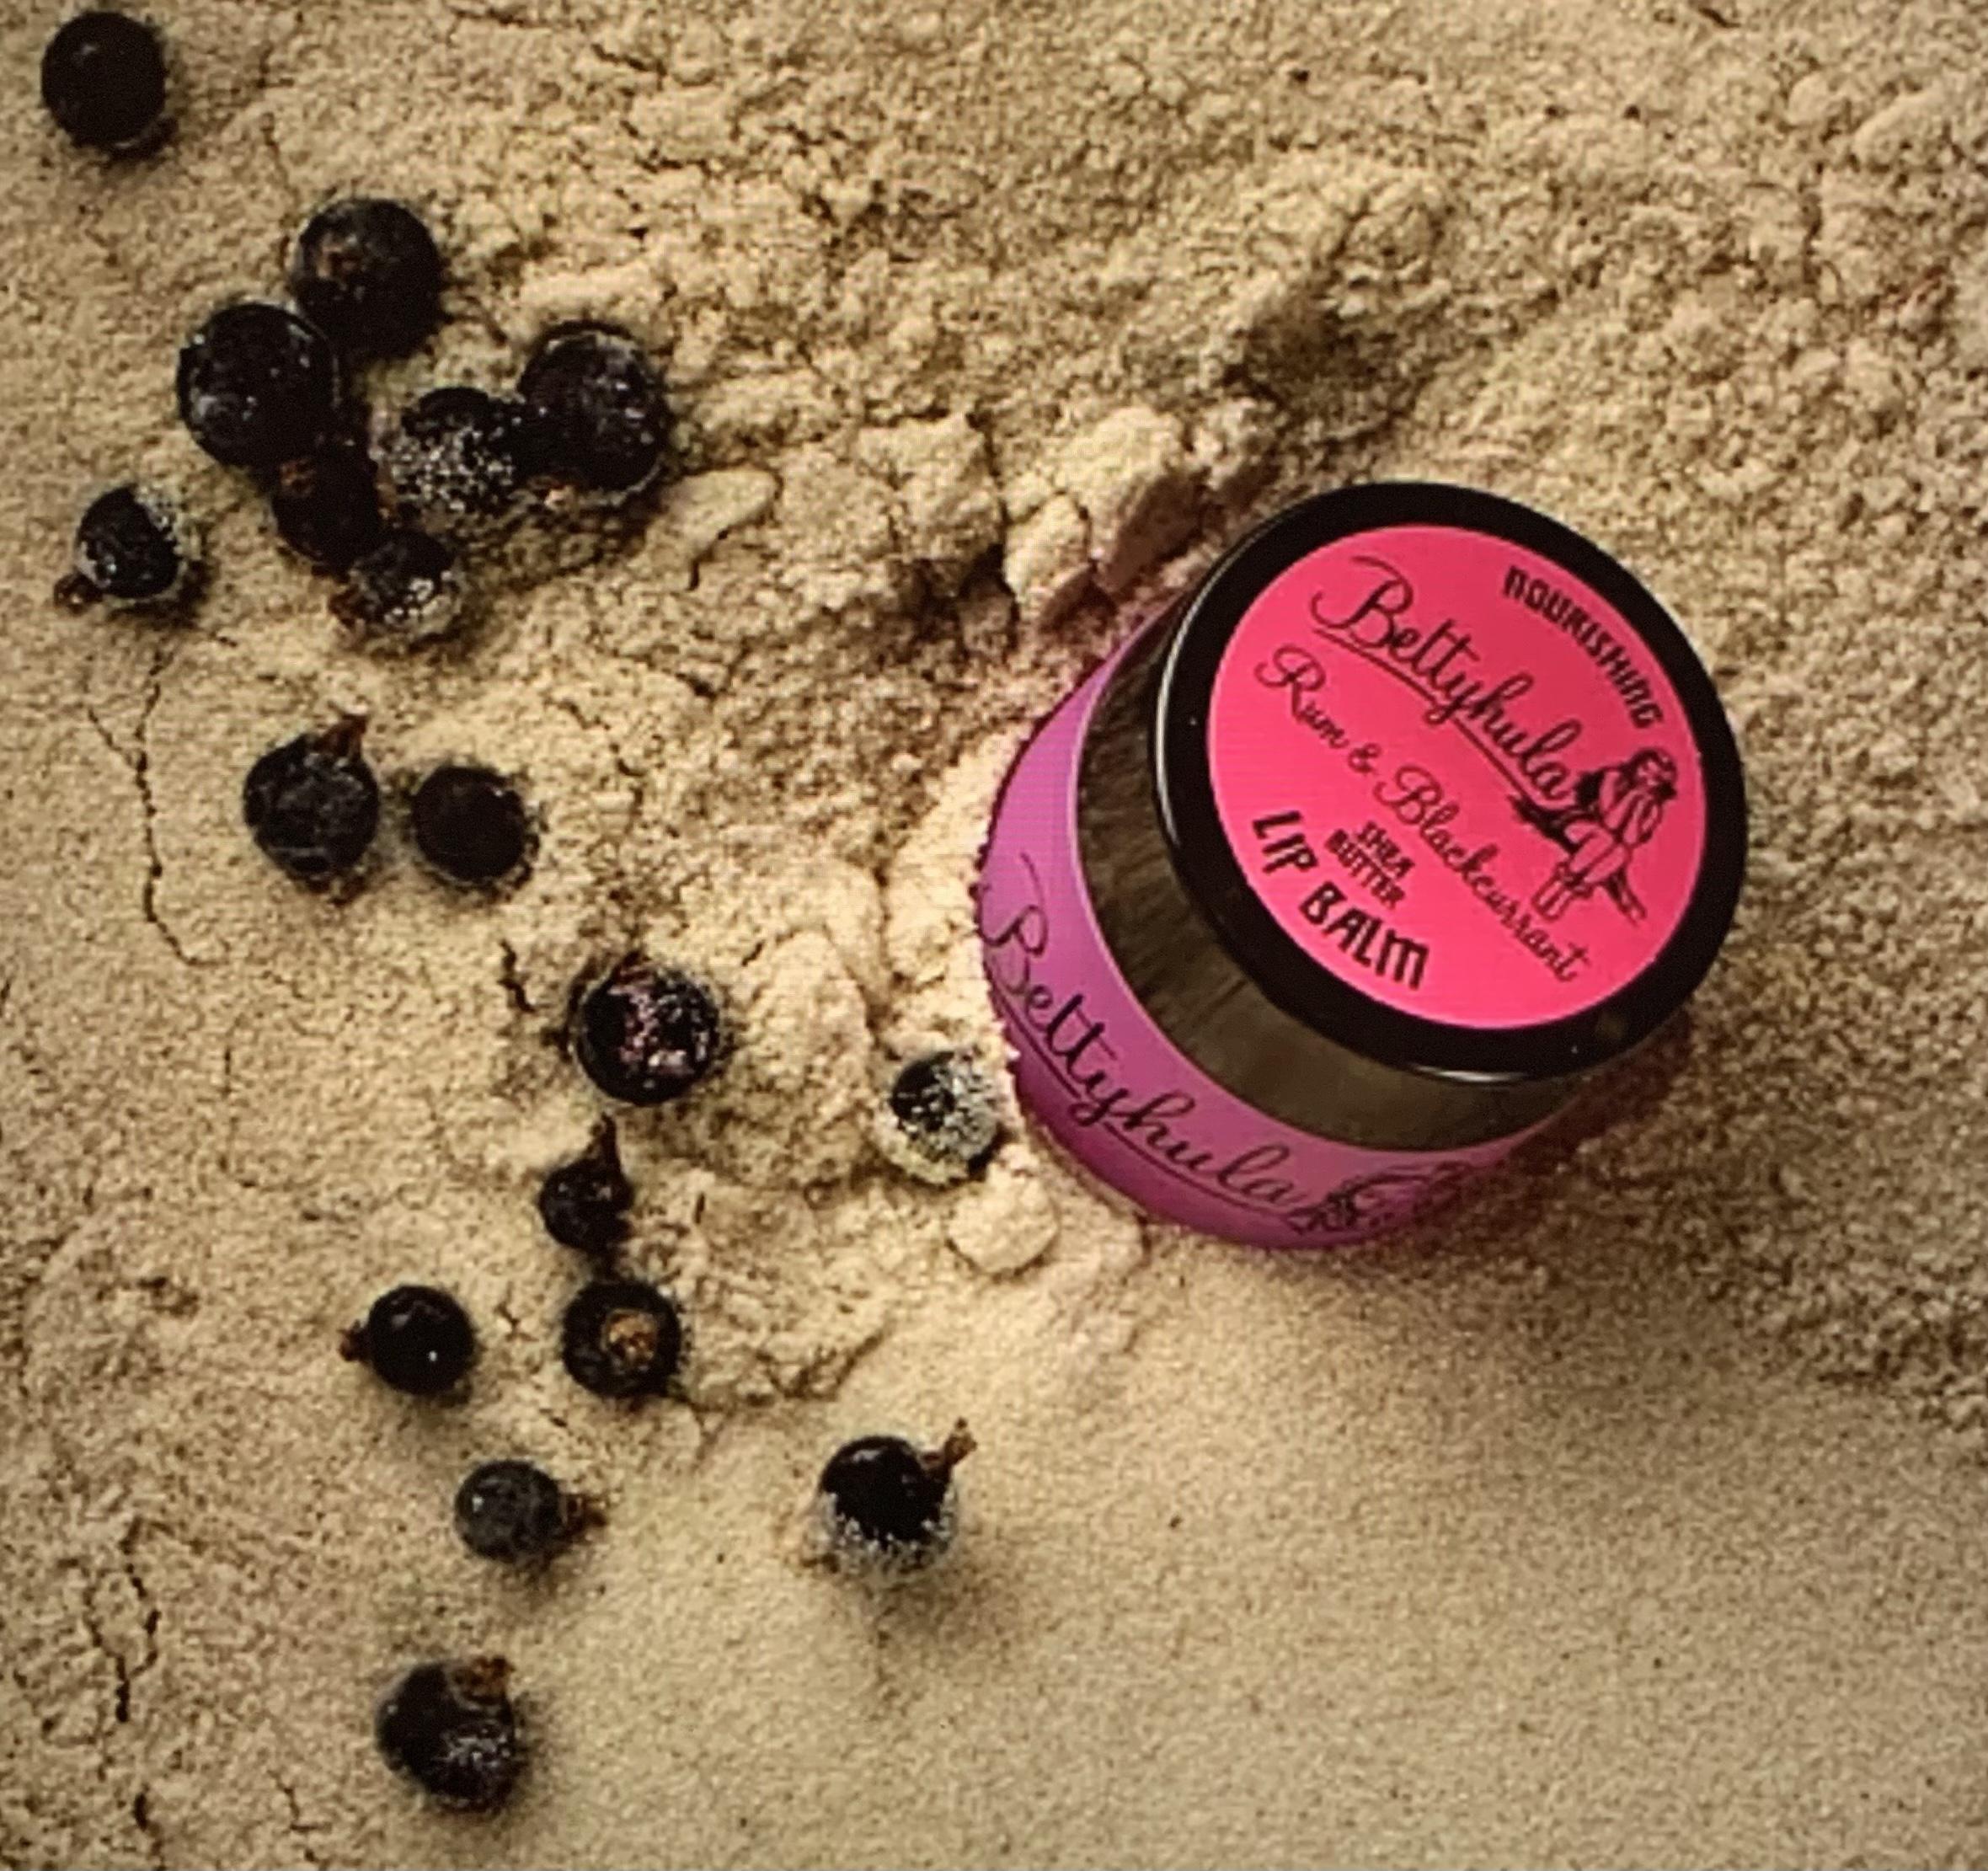 Betty Hula Nourishing Lip Balm - Rum & Blackcurrant